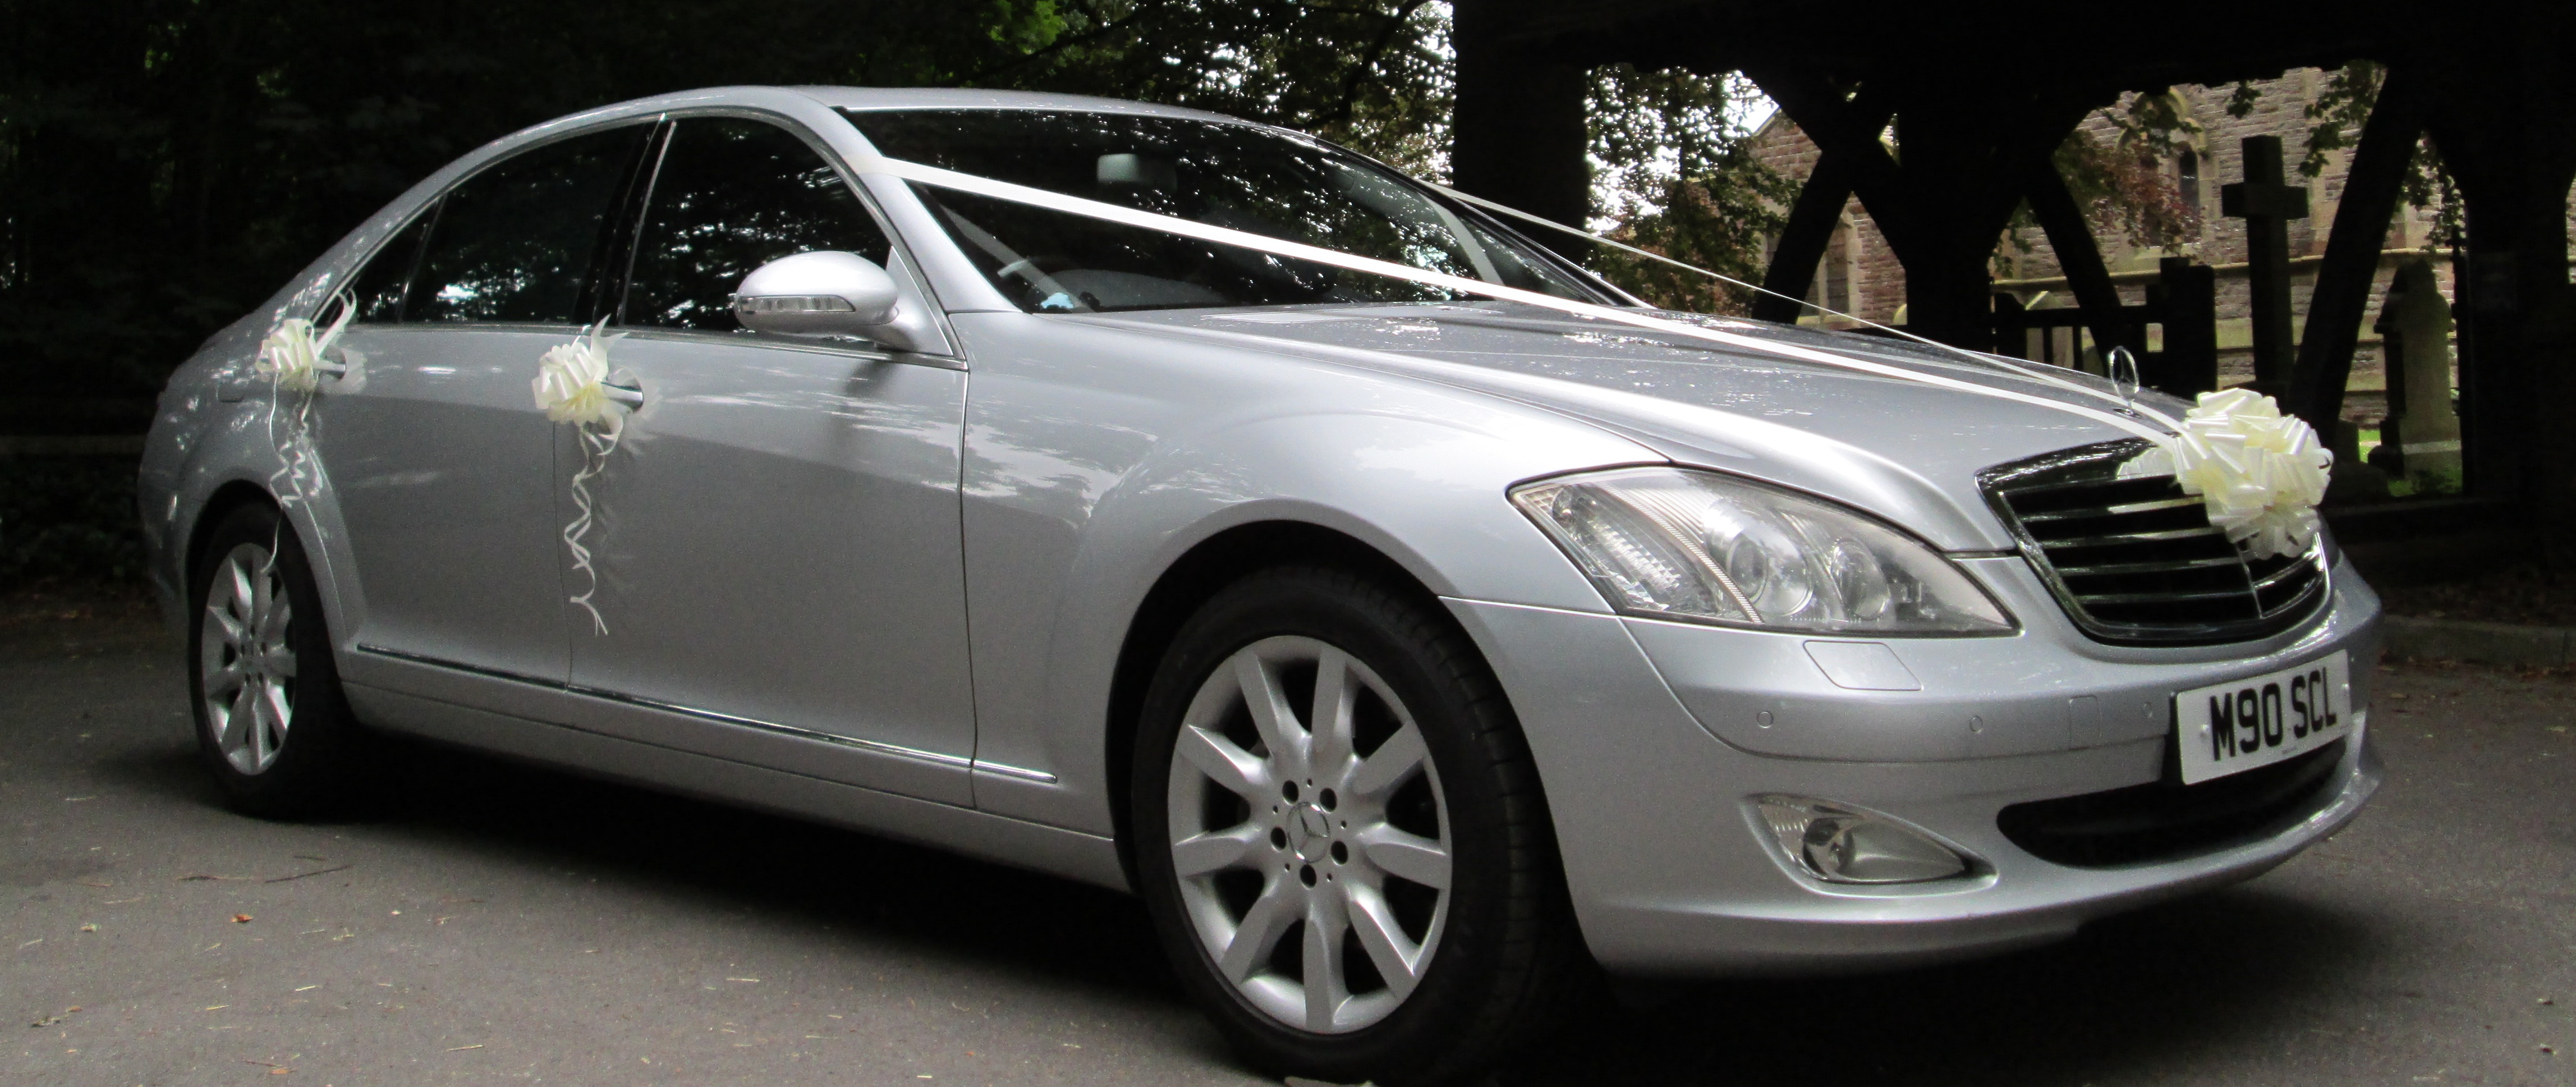 Mercedes S Class Wedding Car Hire Blackpool